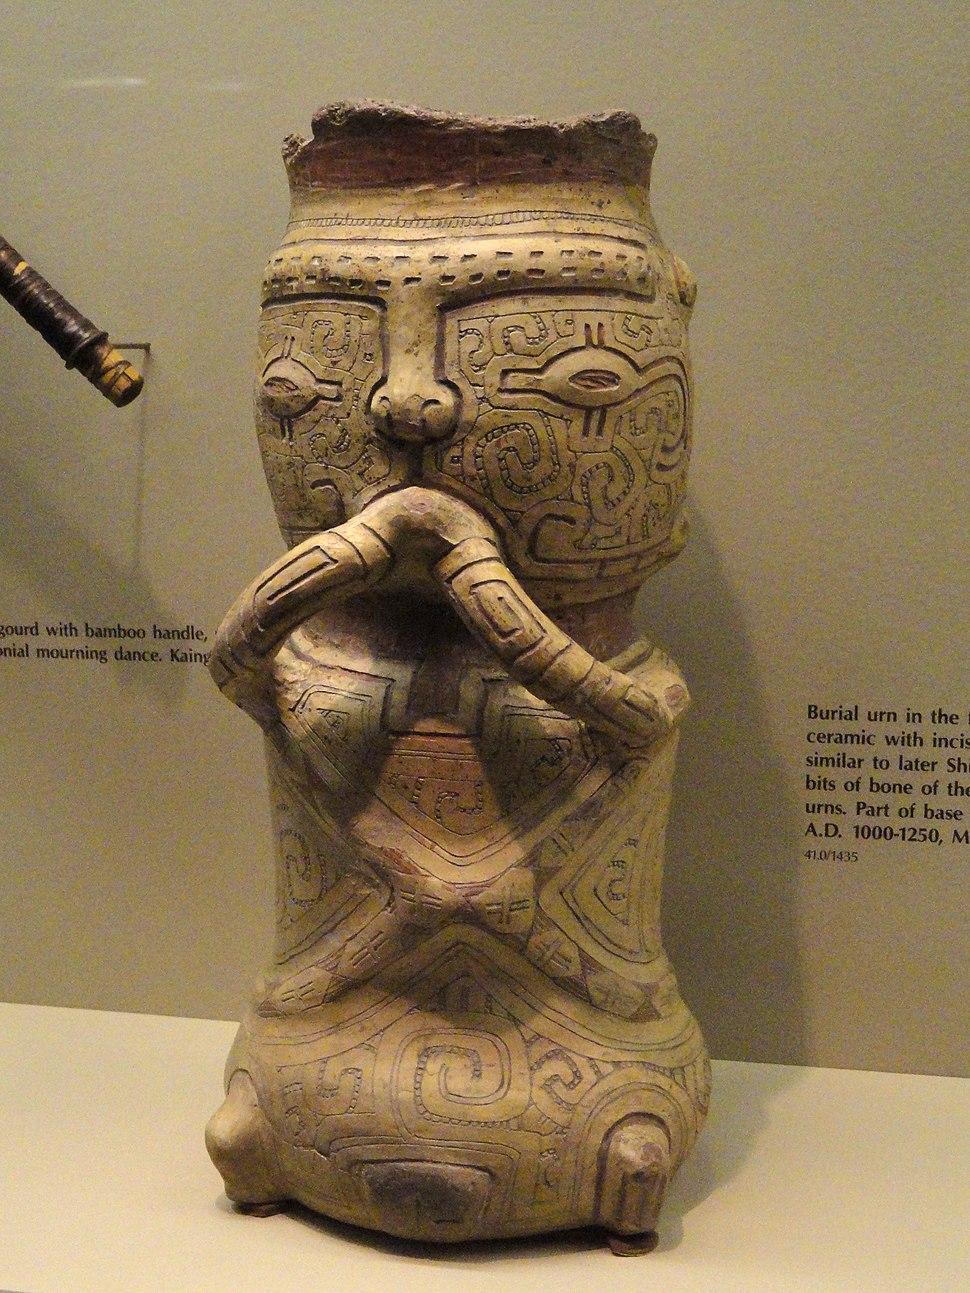 Burian urn, AD 1000-1250, Marajoara culture - AMNH - DSC06177